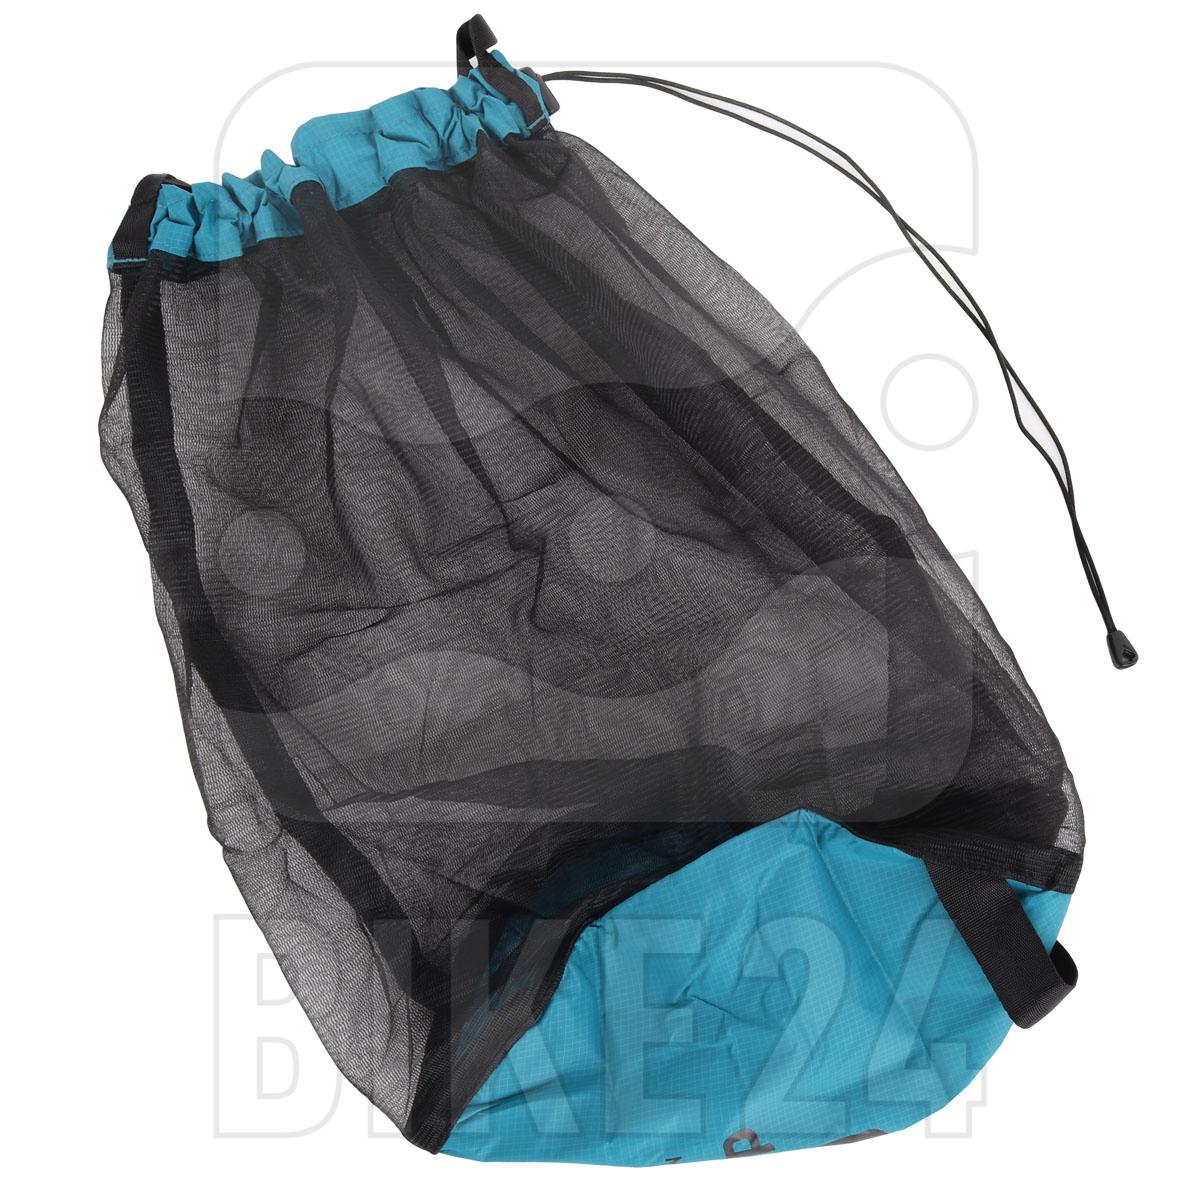 Picture of Deuter Mesh Sack 10 liters - petrol-black